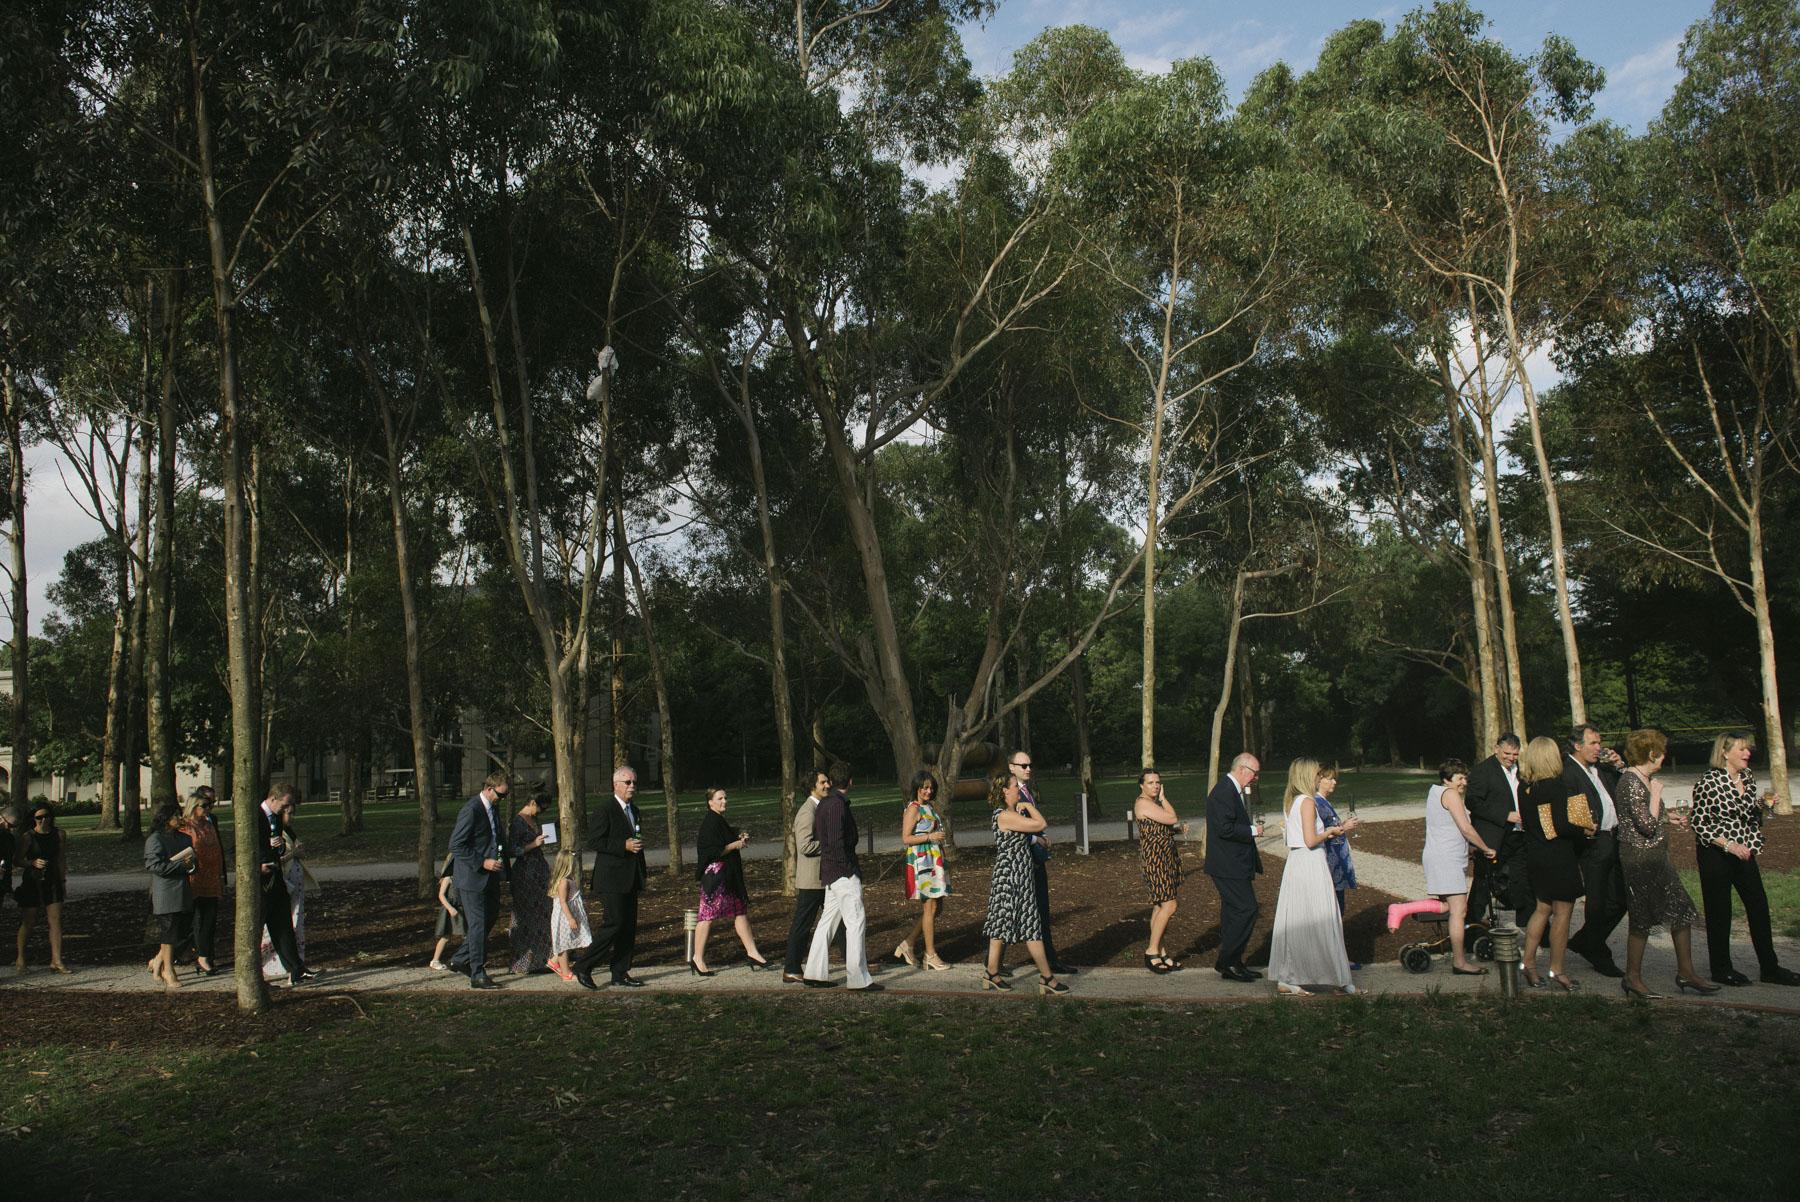 1501vand-286alan_moyle_wedding_portrait_brighton_bayside_werribee_estate_mansion_zoo_rustic_styled_garden_mansion_candid_documentry_victoria_whitelaw.jpg